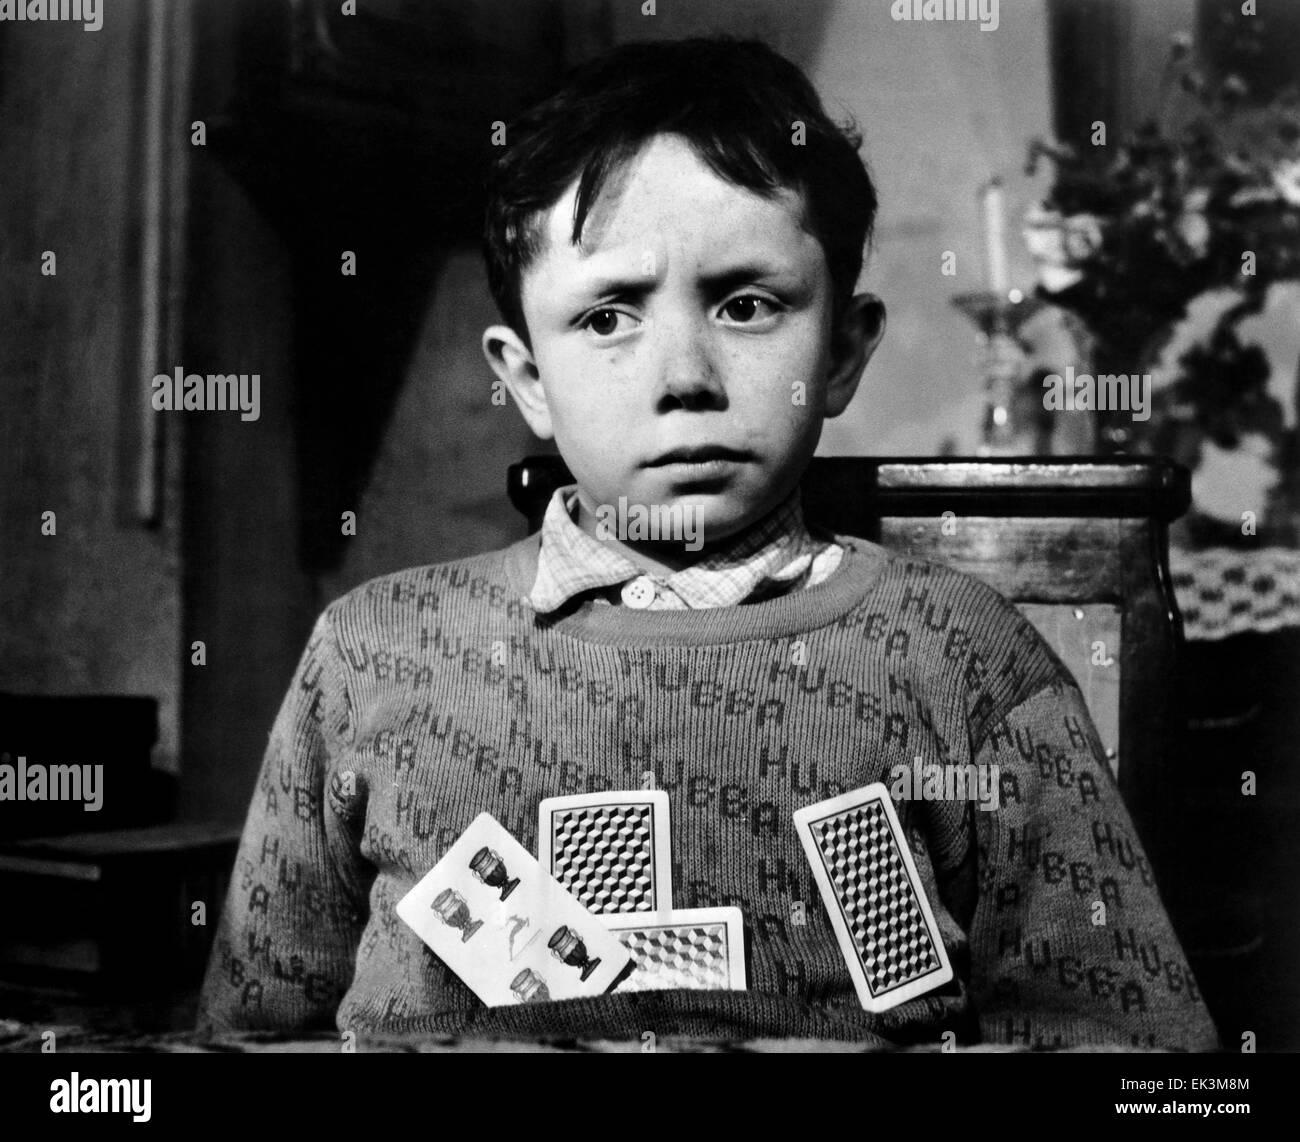 pierino-bilancioni-on-set-of-the-film-go